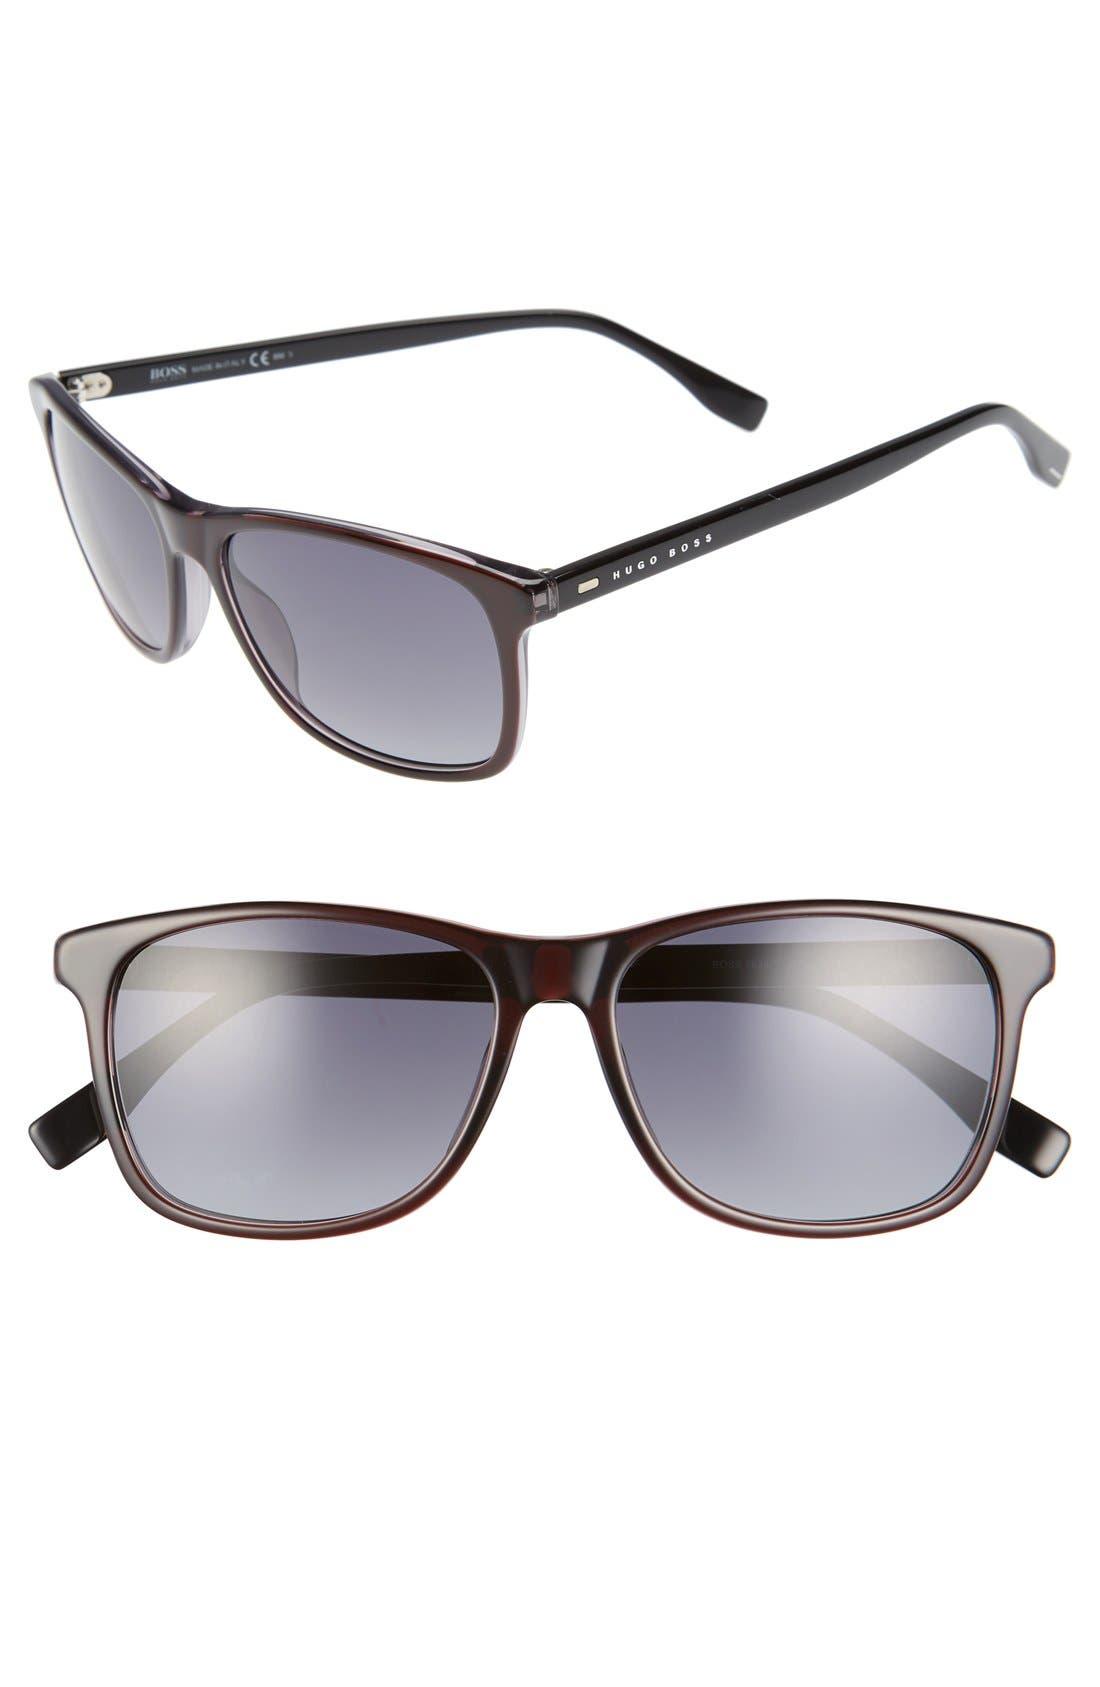 BOSS 0634/S 55mm Sunglasses